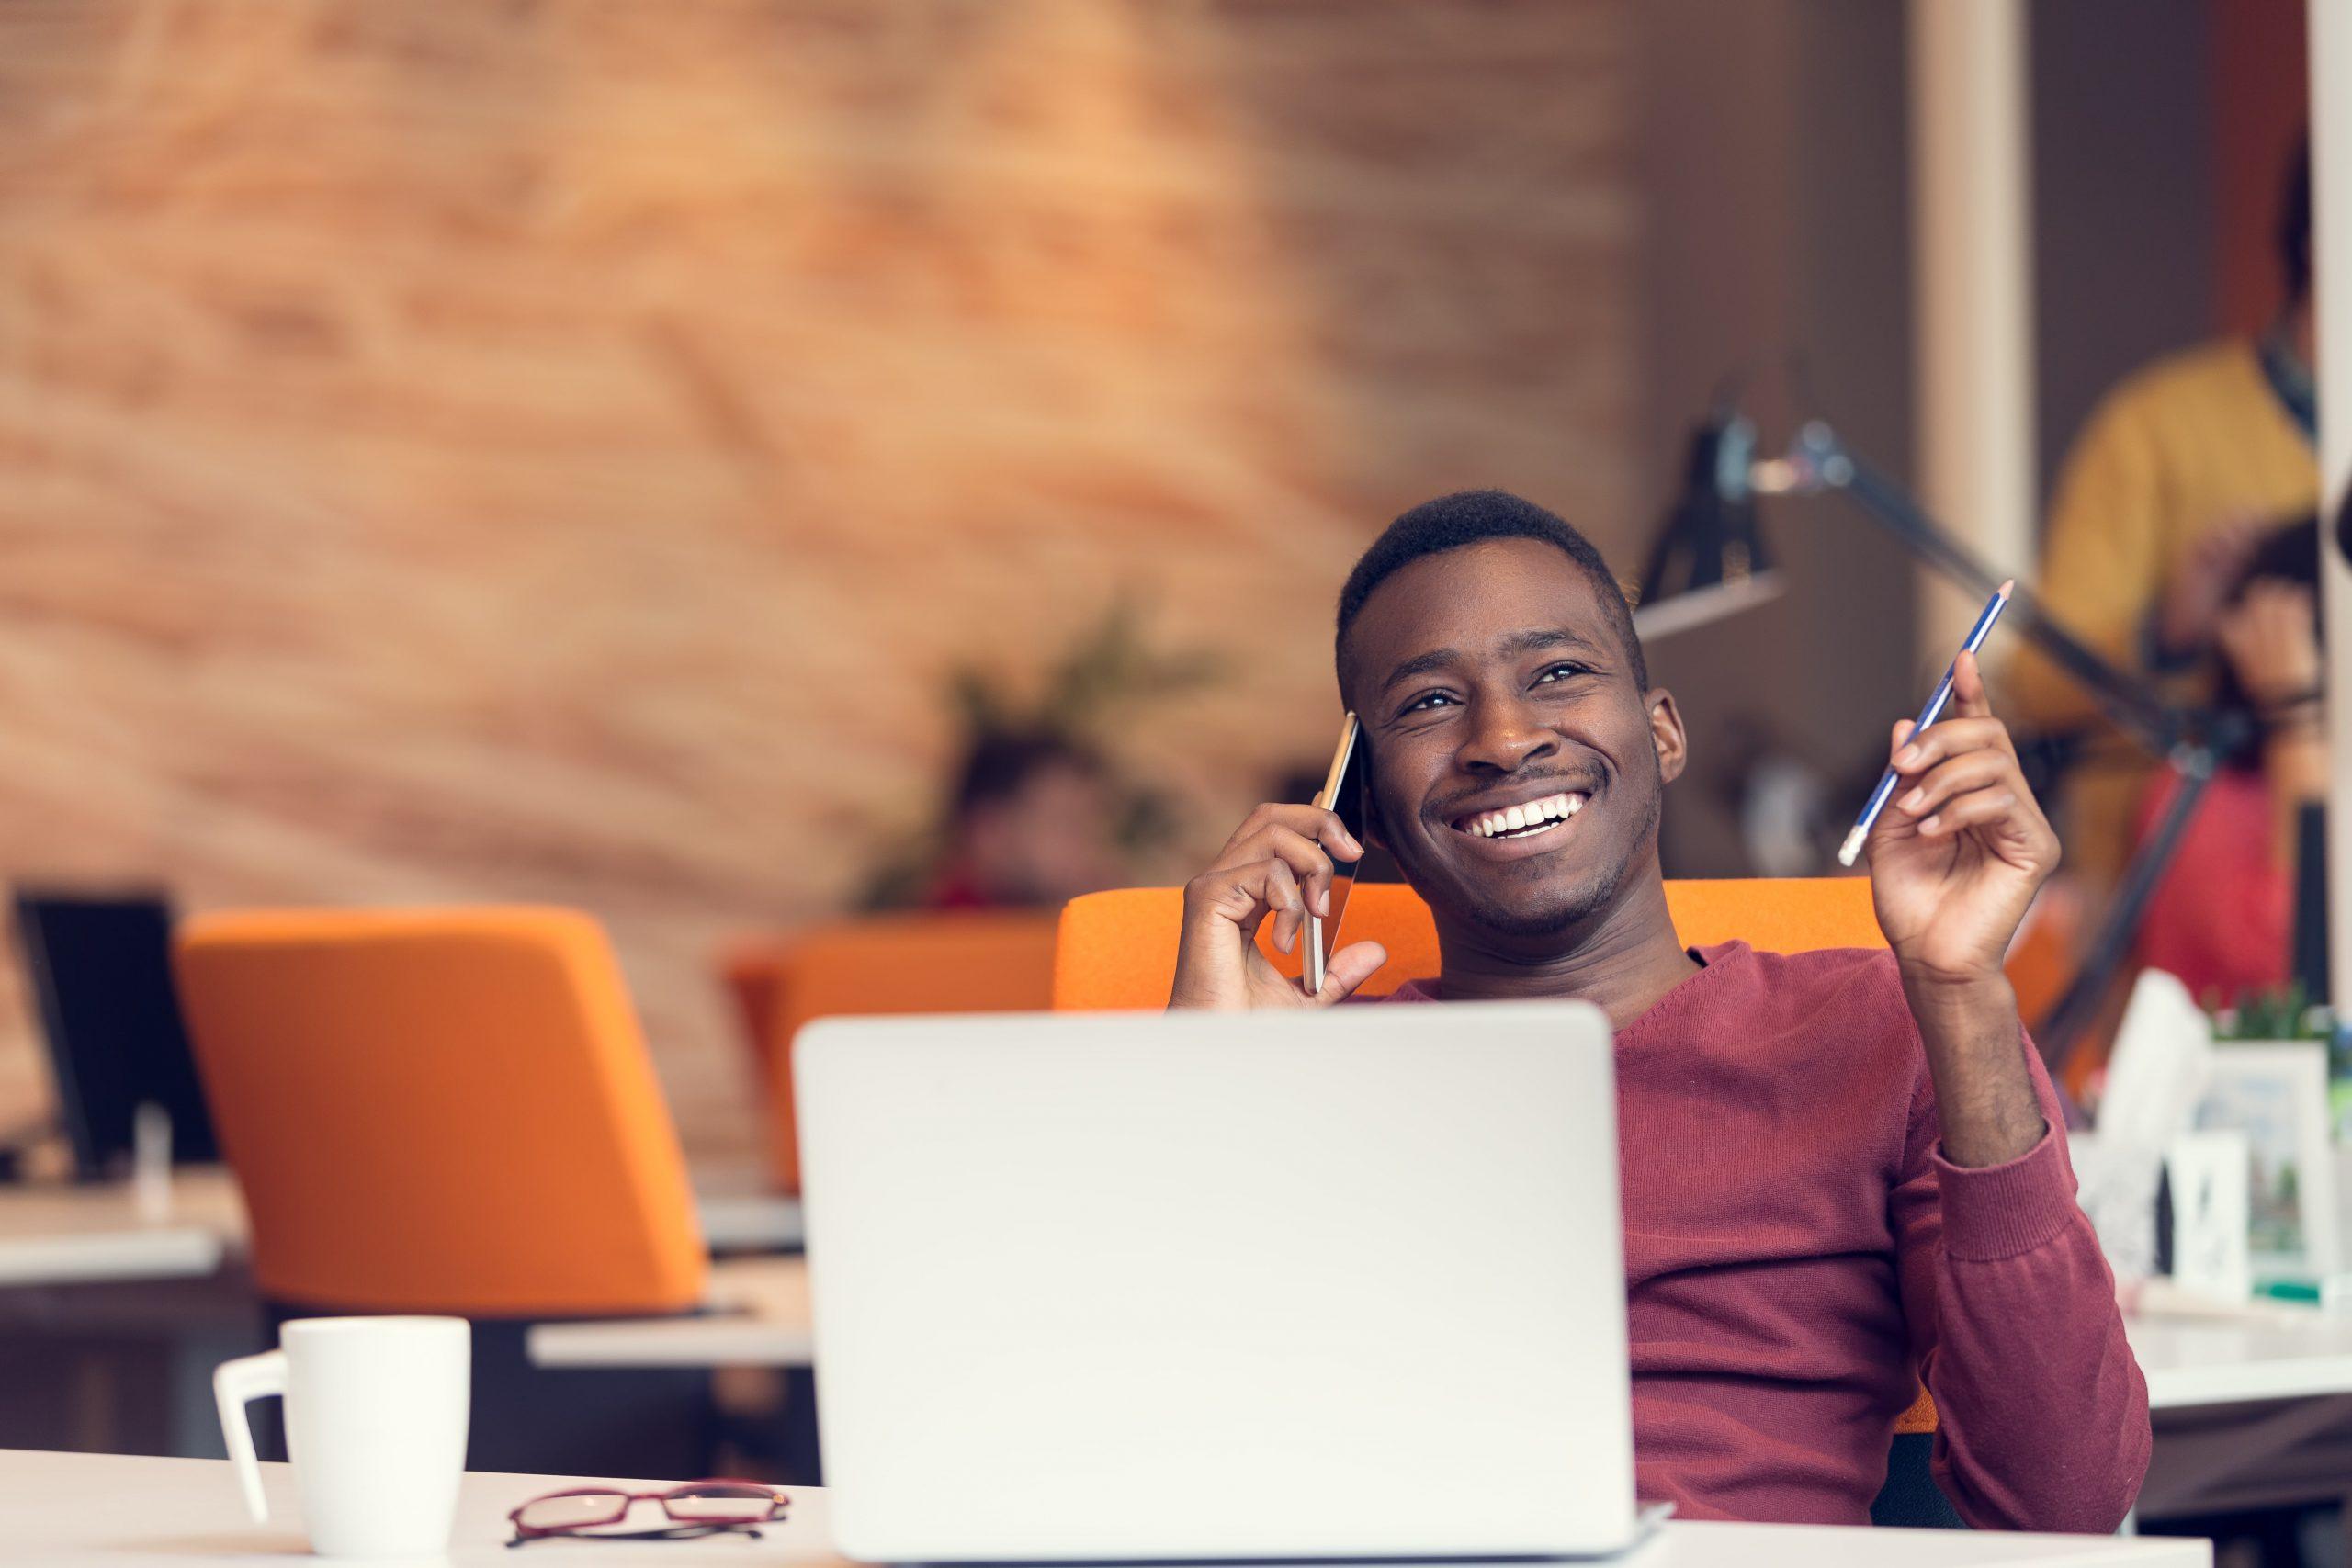 Atendimento Omnichannel: como definir os canais ideais para o seu cliente